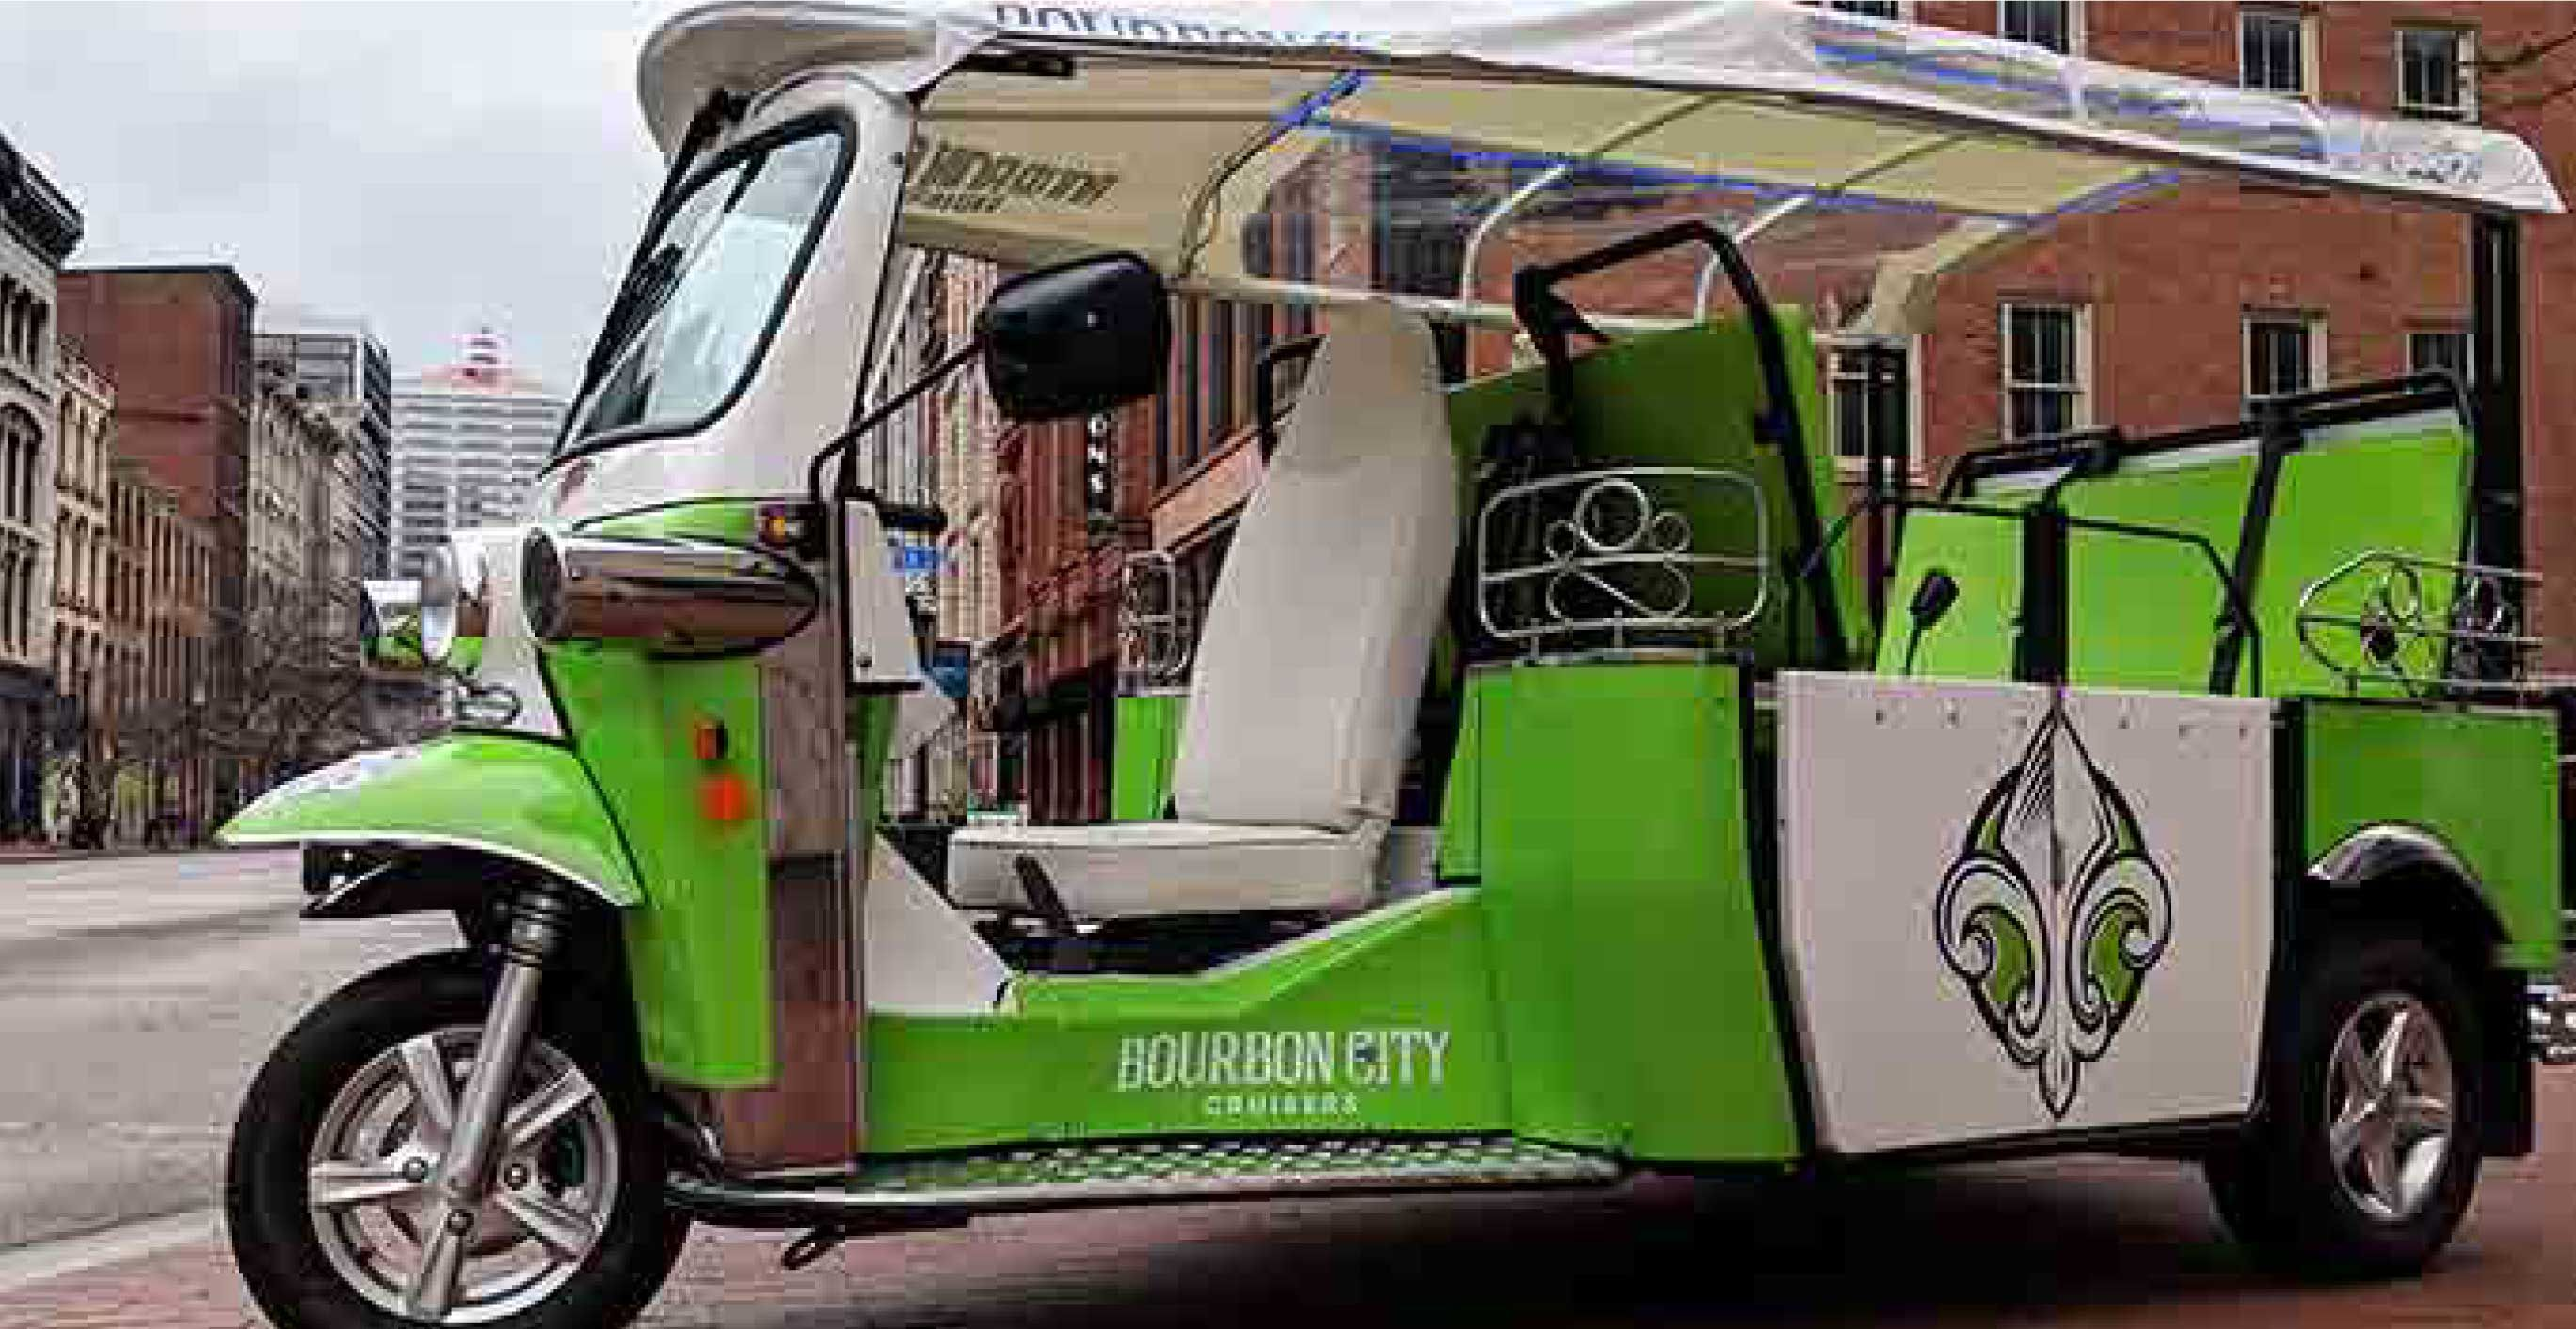 Bourbon City Cruisers